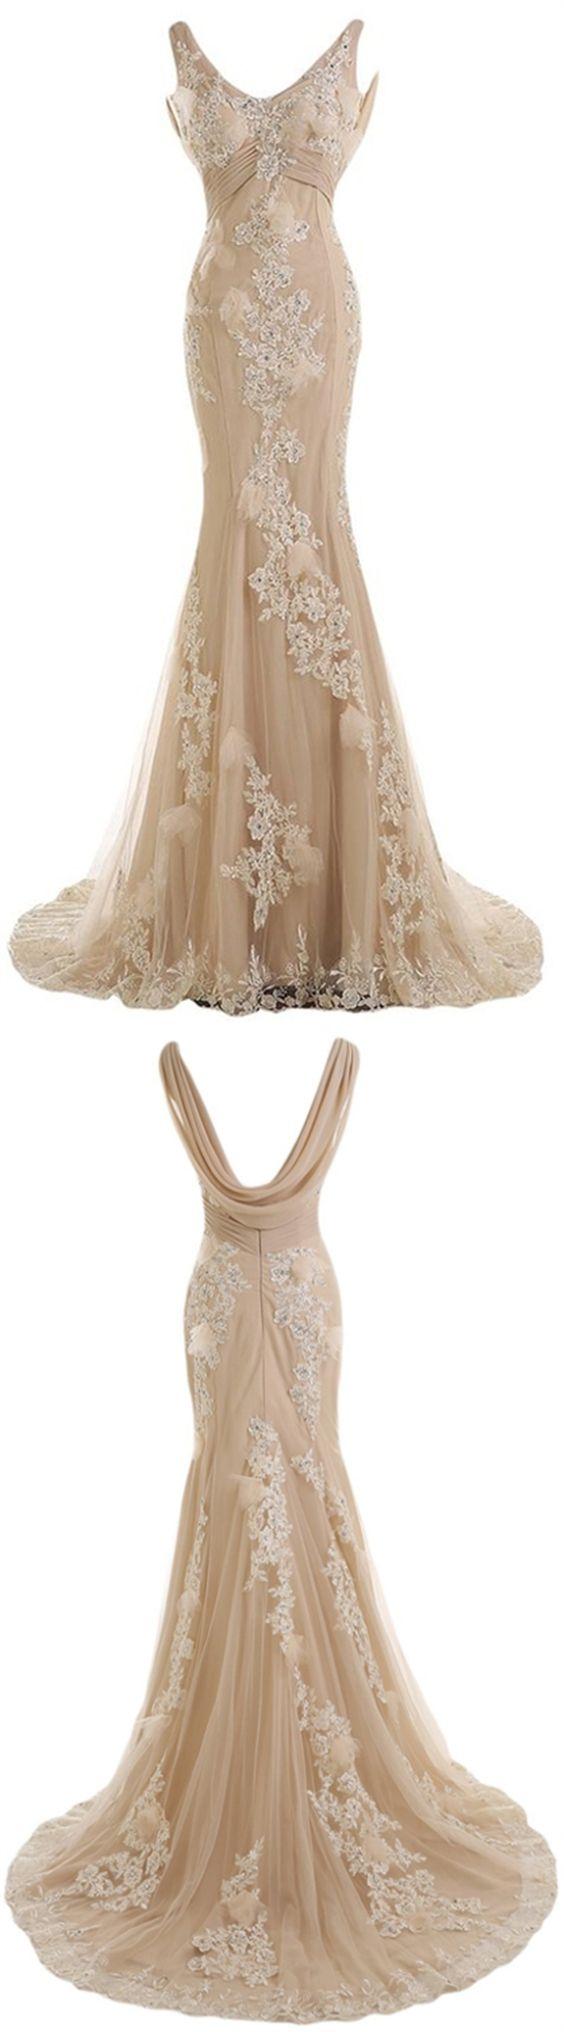 Gorgeous Champagne V-neck Bridal Dress, Mermaid Sweep Train Chiffon Lace Wedding Dress